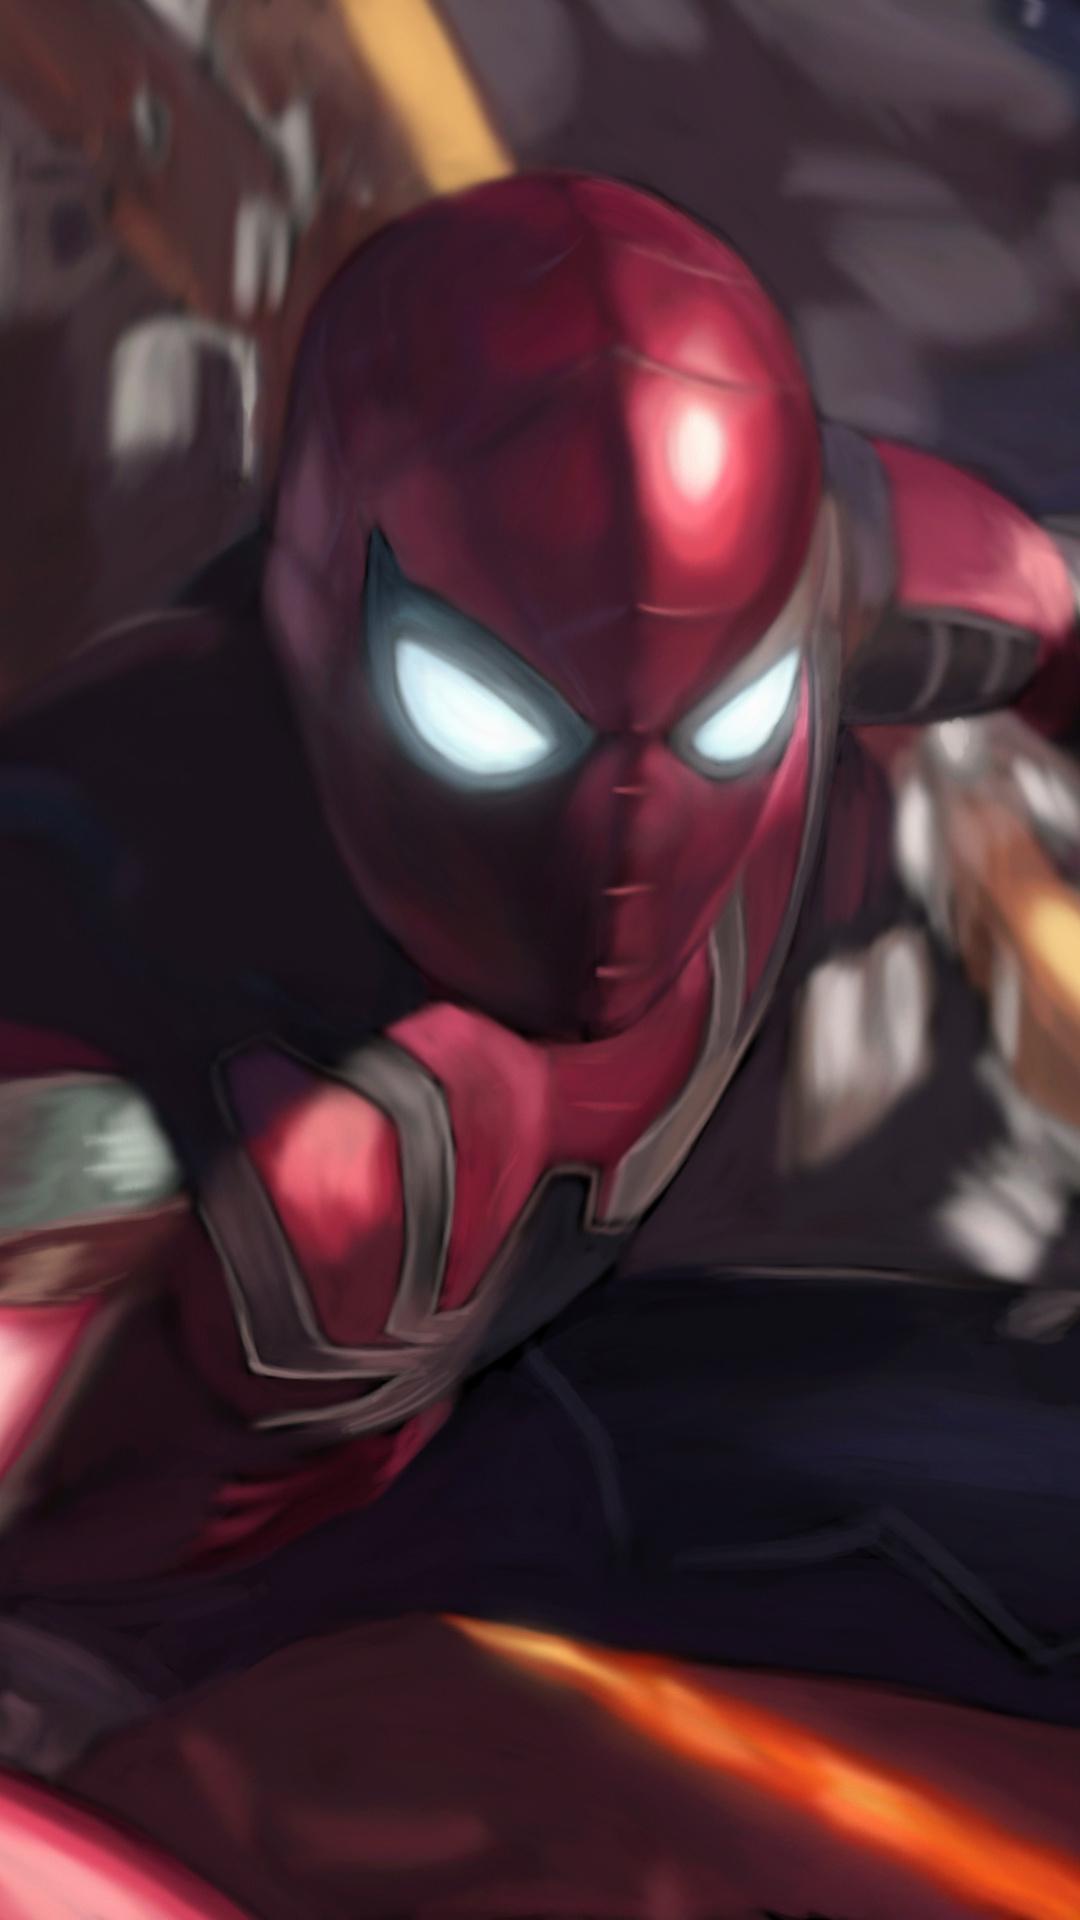 Thanos Wallpaper Iphone X 1080x1920 Spiderman New Suit In Infinity War 4k Iphone 7